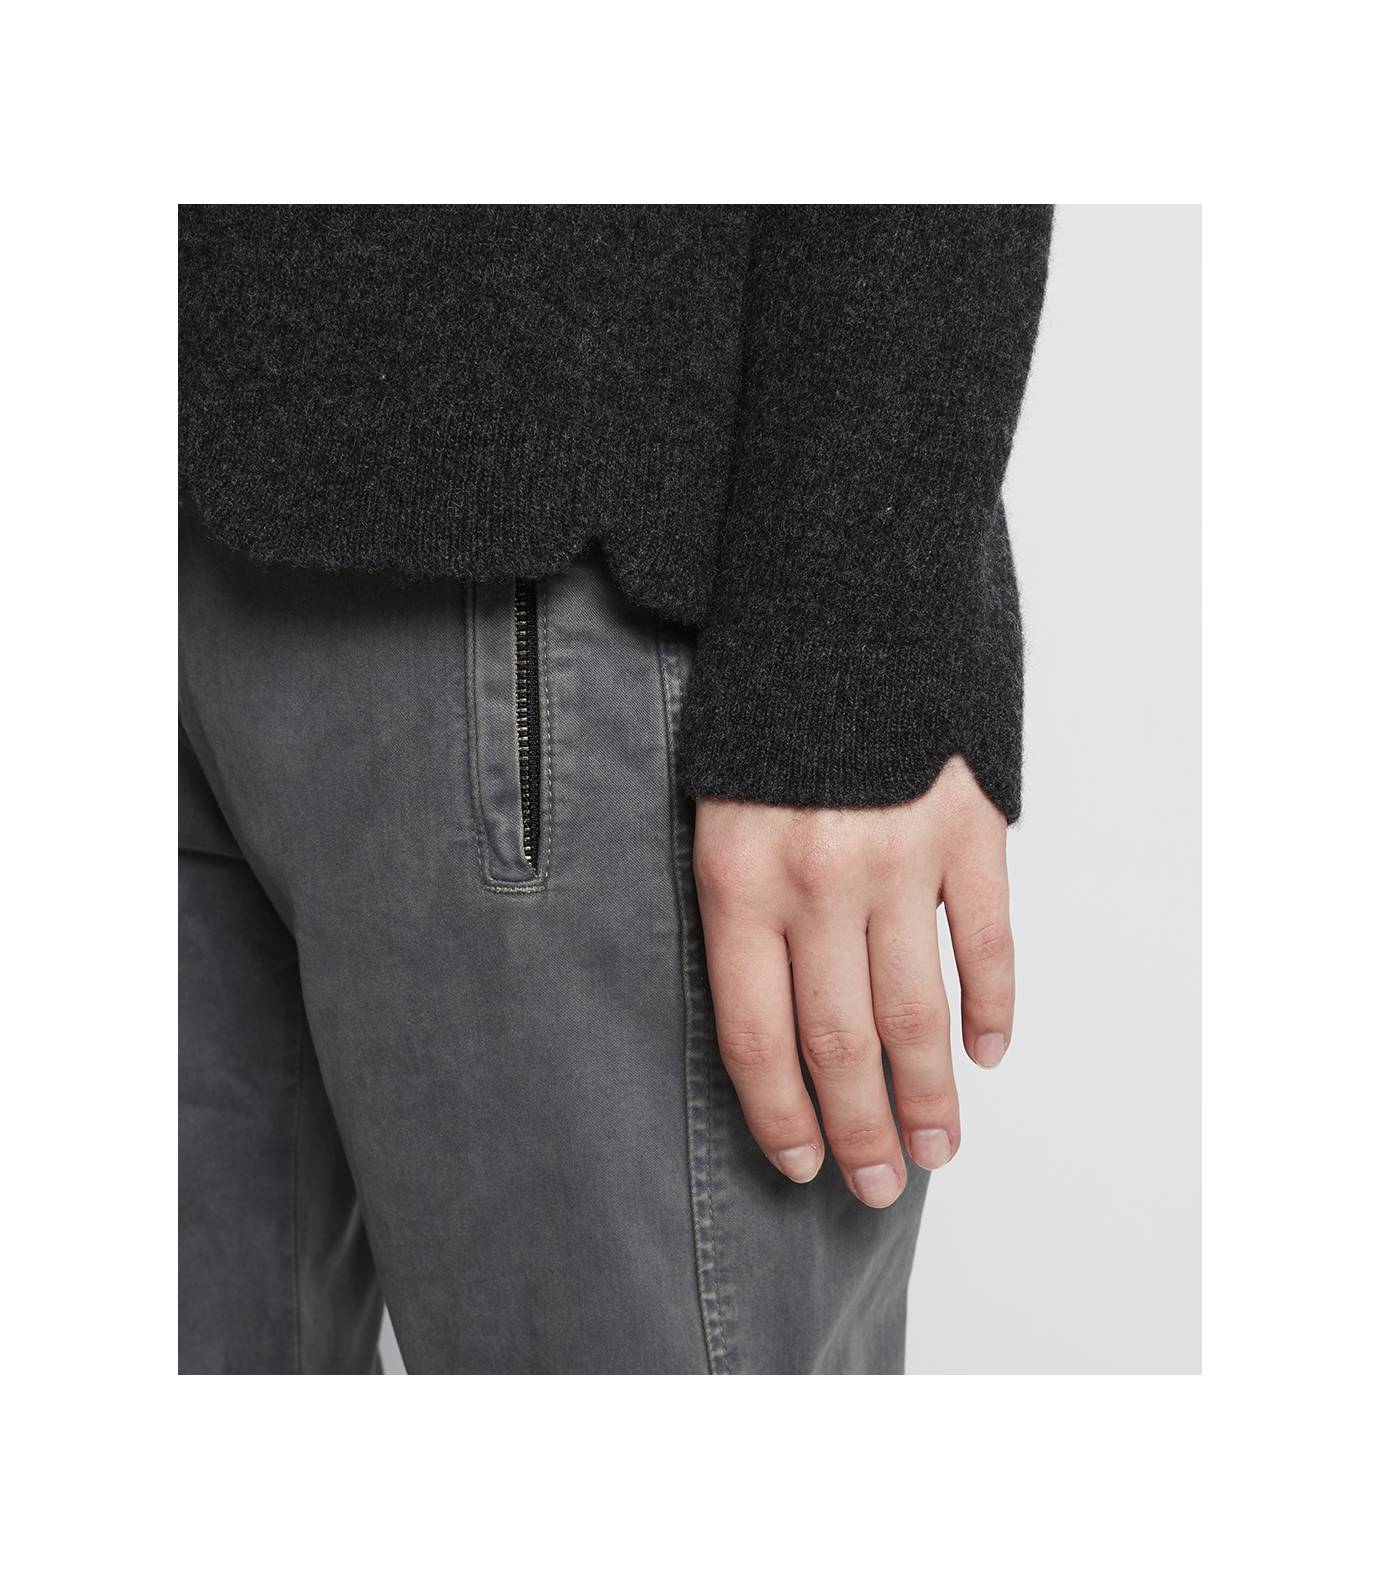 Italy Douillet tricot fin Shirt Pull Pull à print 36 38 Nouveau e786